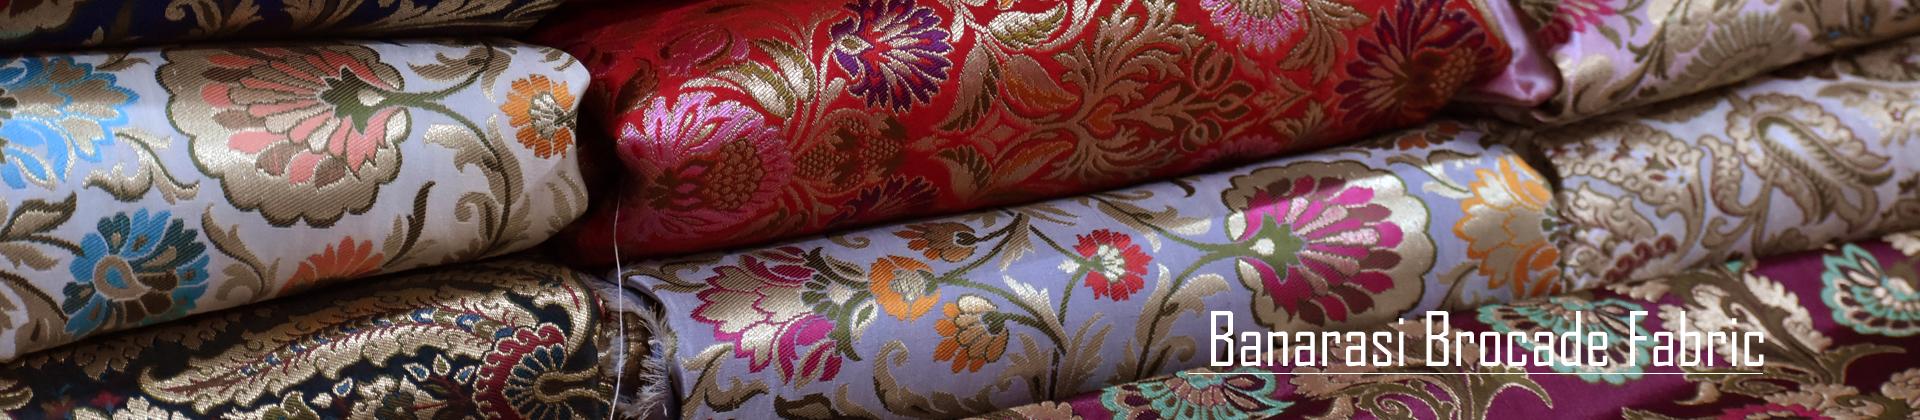 Banarasi Brocade Fabric